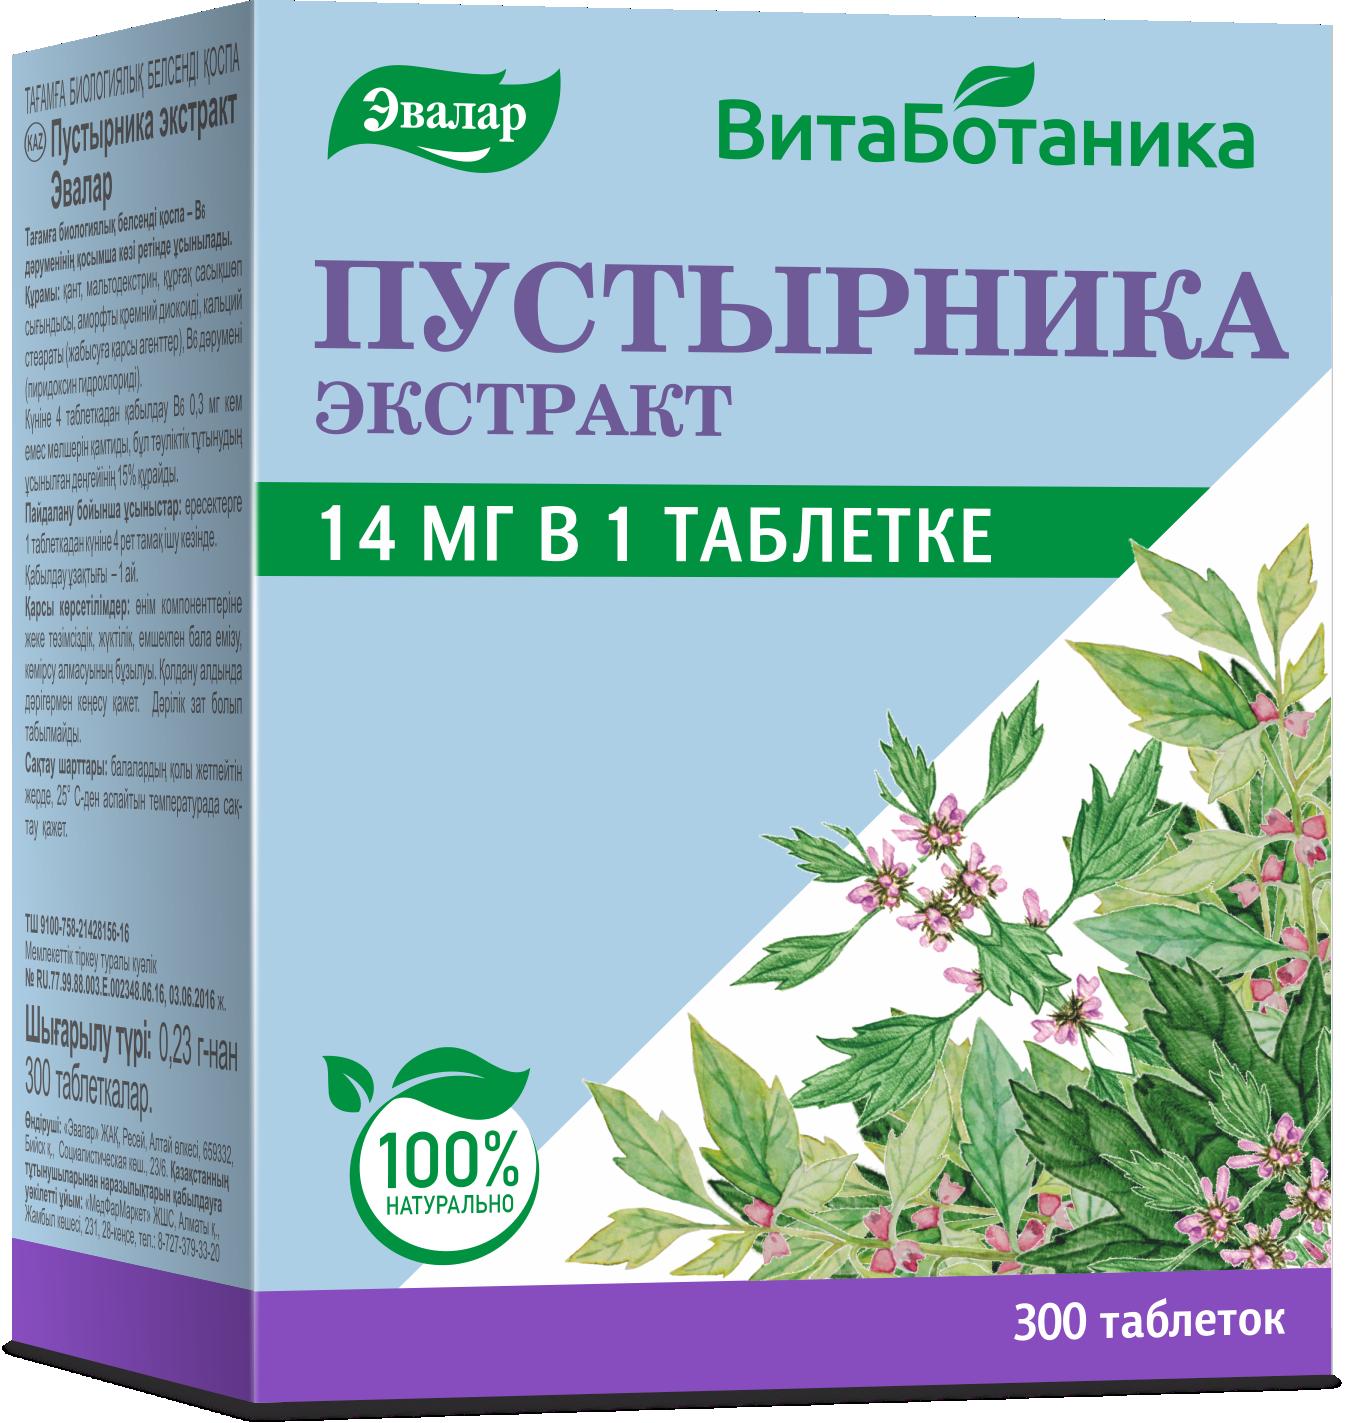 Пустырника экстракт, 300 таблеток, Эвалар